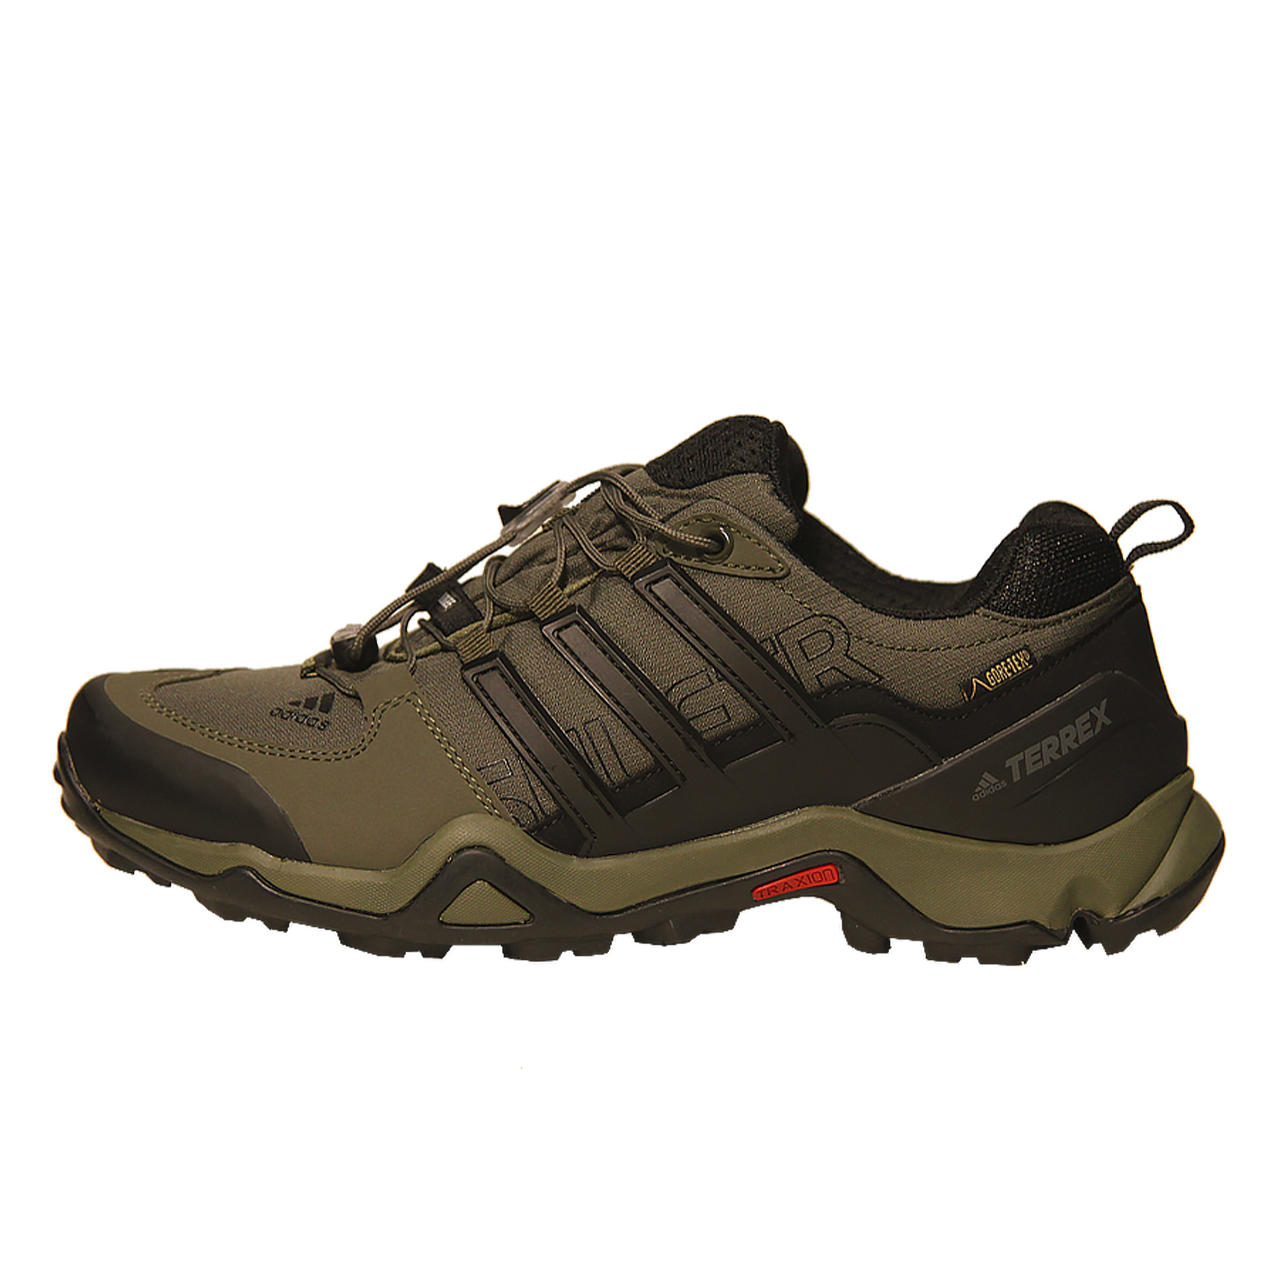 کفش راحتی آدیداس مدل Terrex 909a